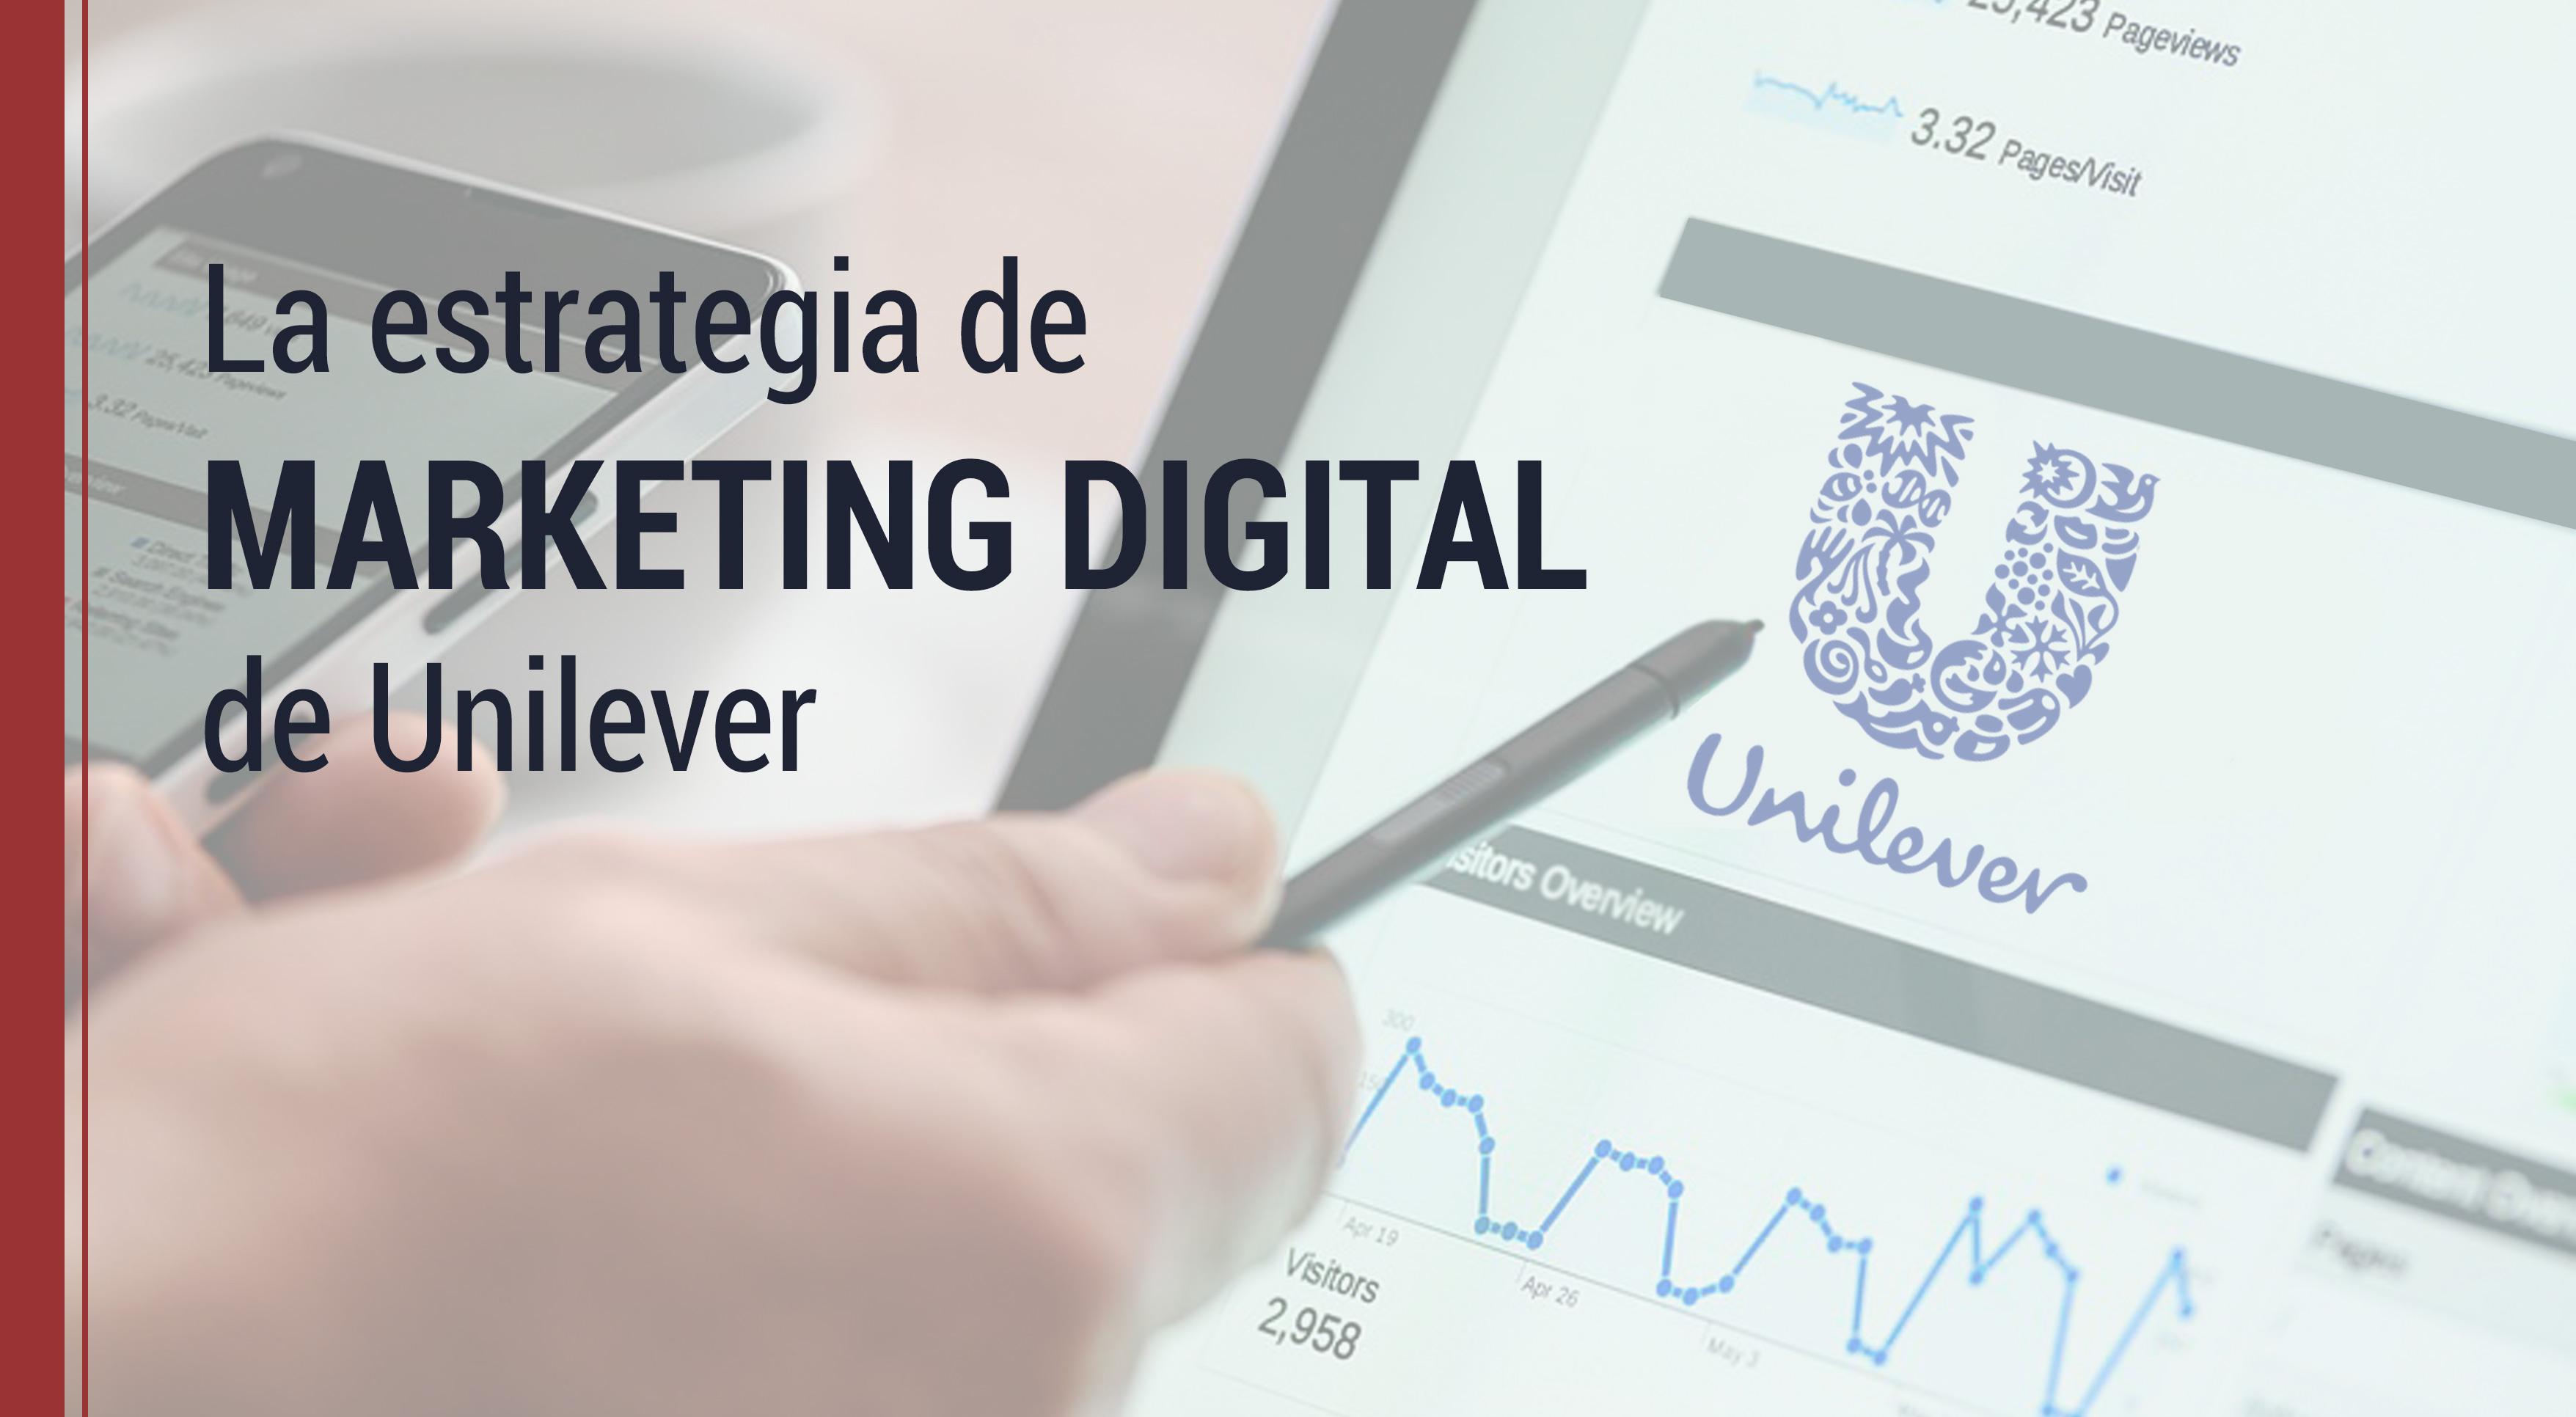 la estrategia de marketing digital de unilever